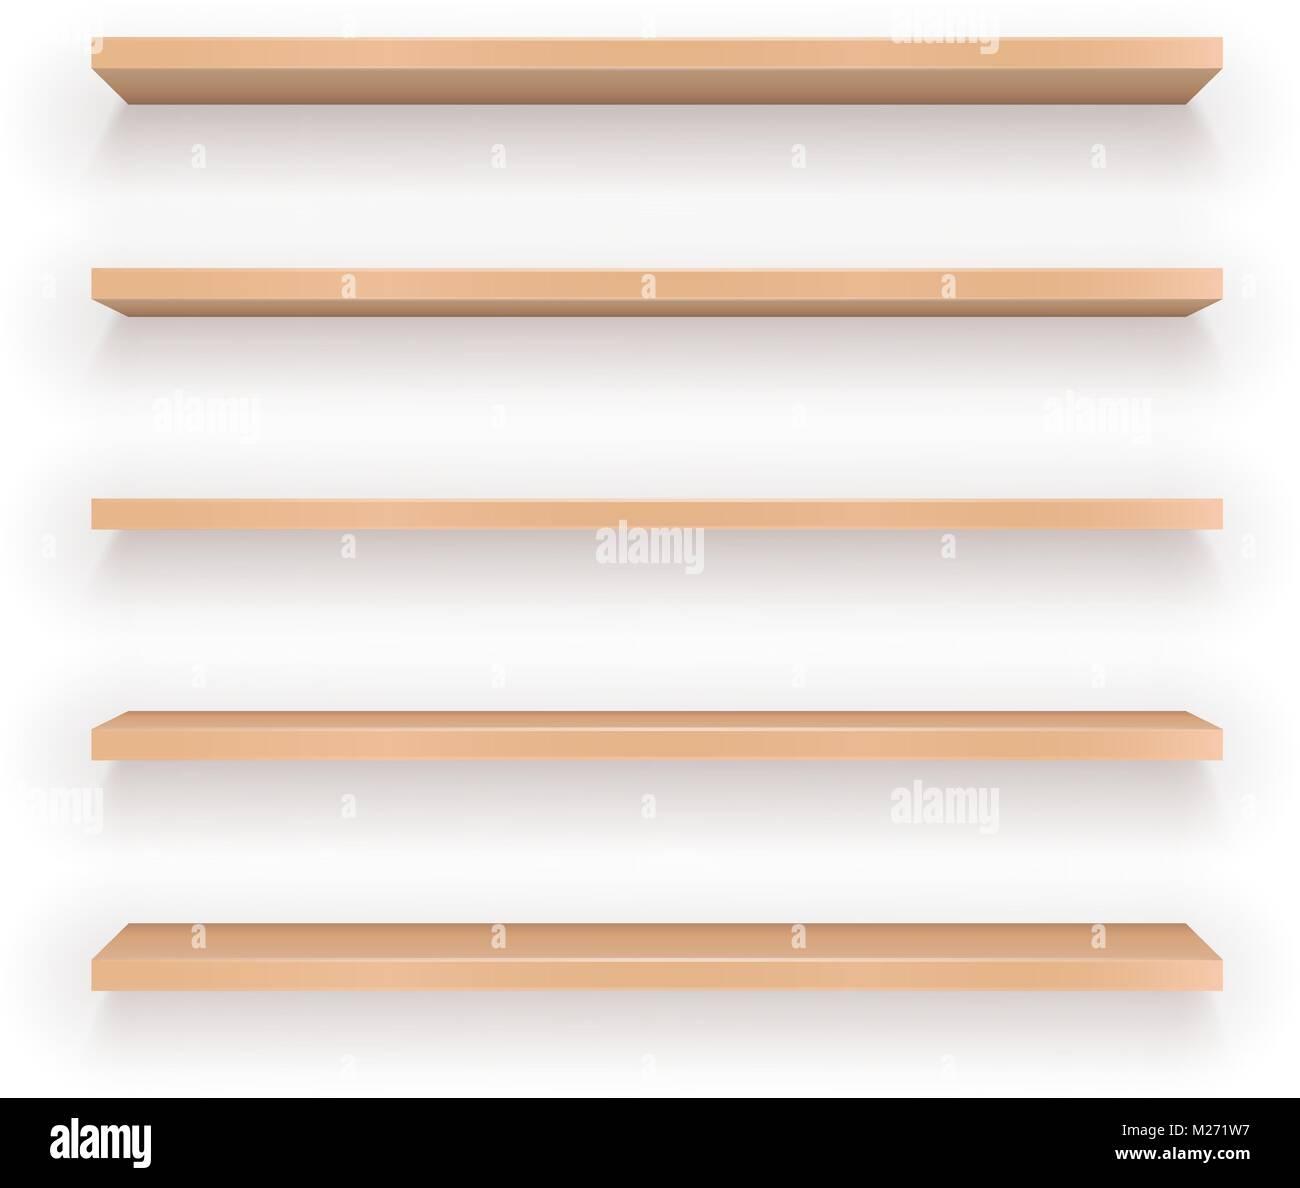 Set of Wood Shelves - Stock Image